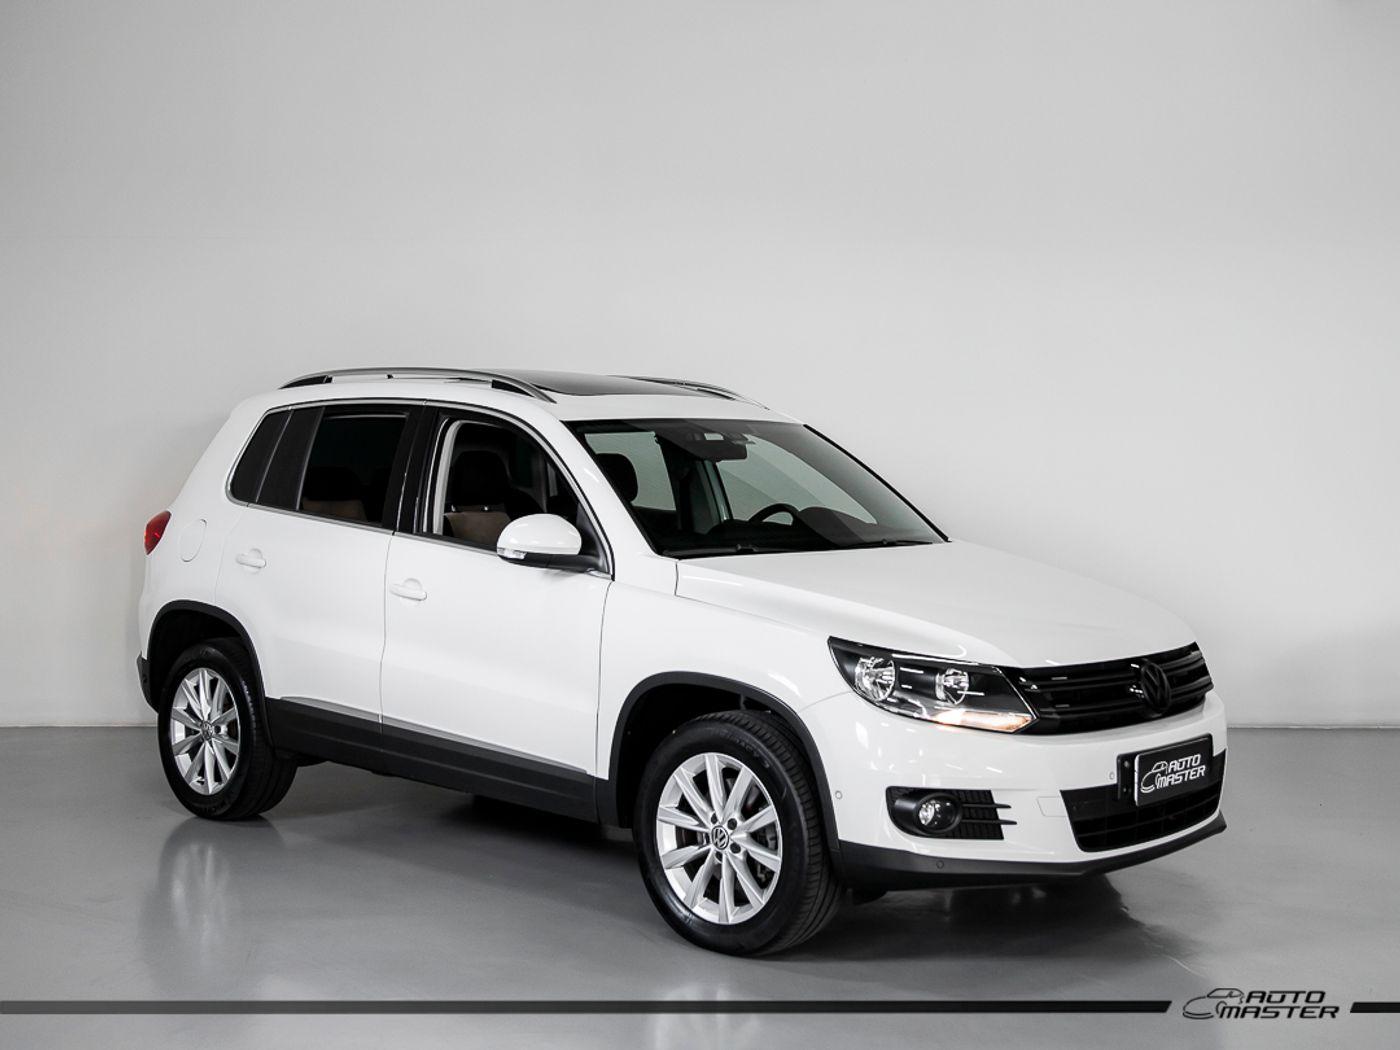 VolksWagen TIGUAN 2.0 TSI 16V 200cv Tiptronic 5p